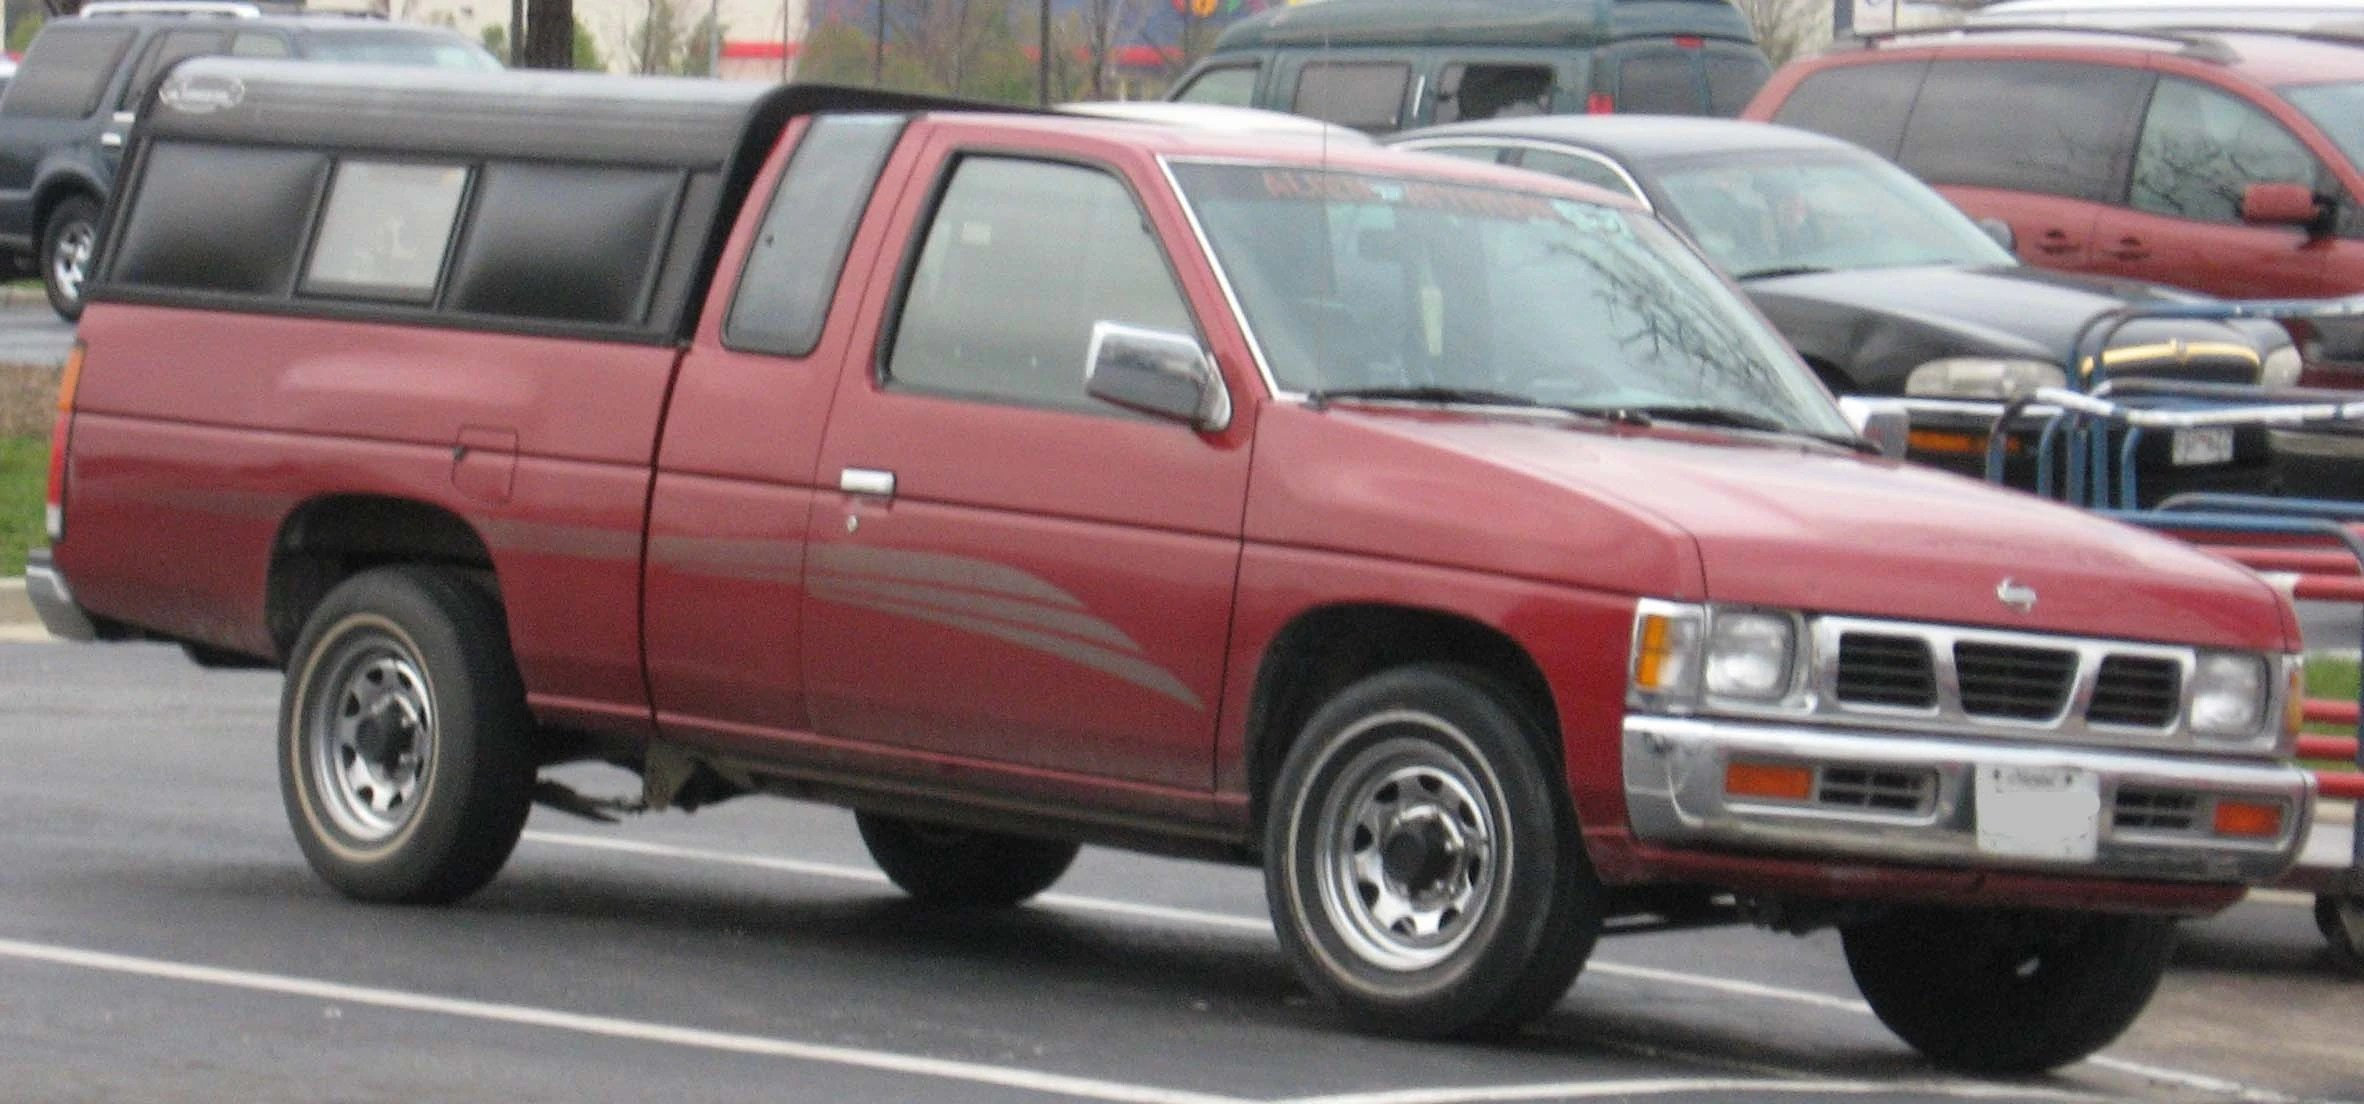 medium resolution of nissan hardbody truck with updated interior mild hood bumper and grille refresh 1993 5 1997